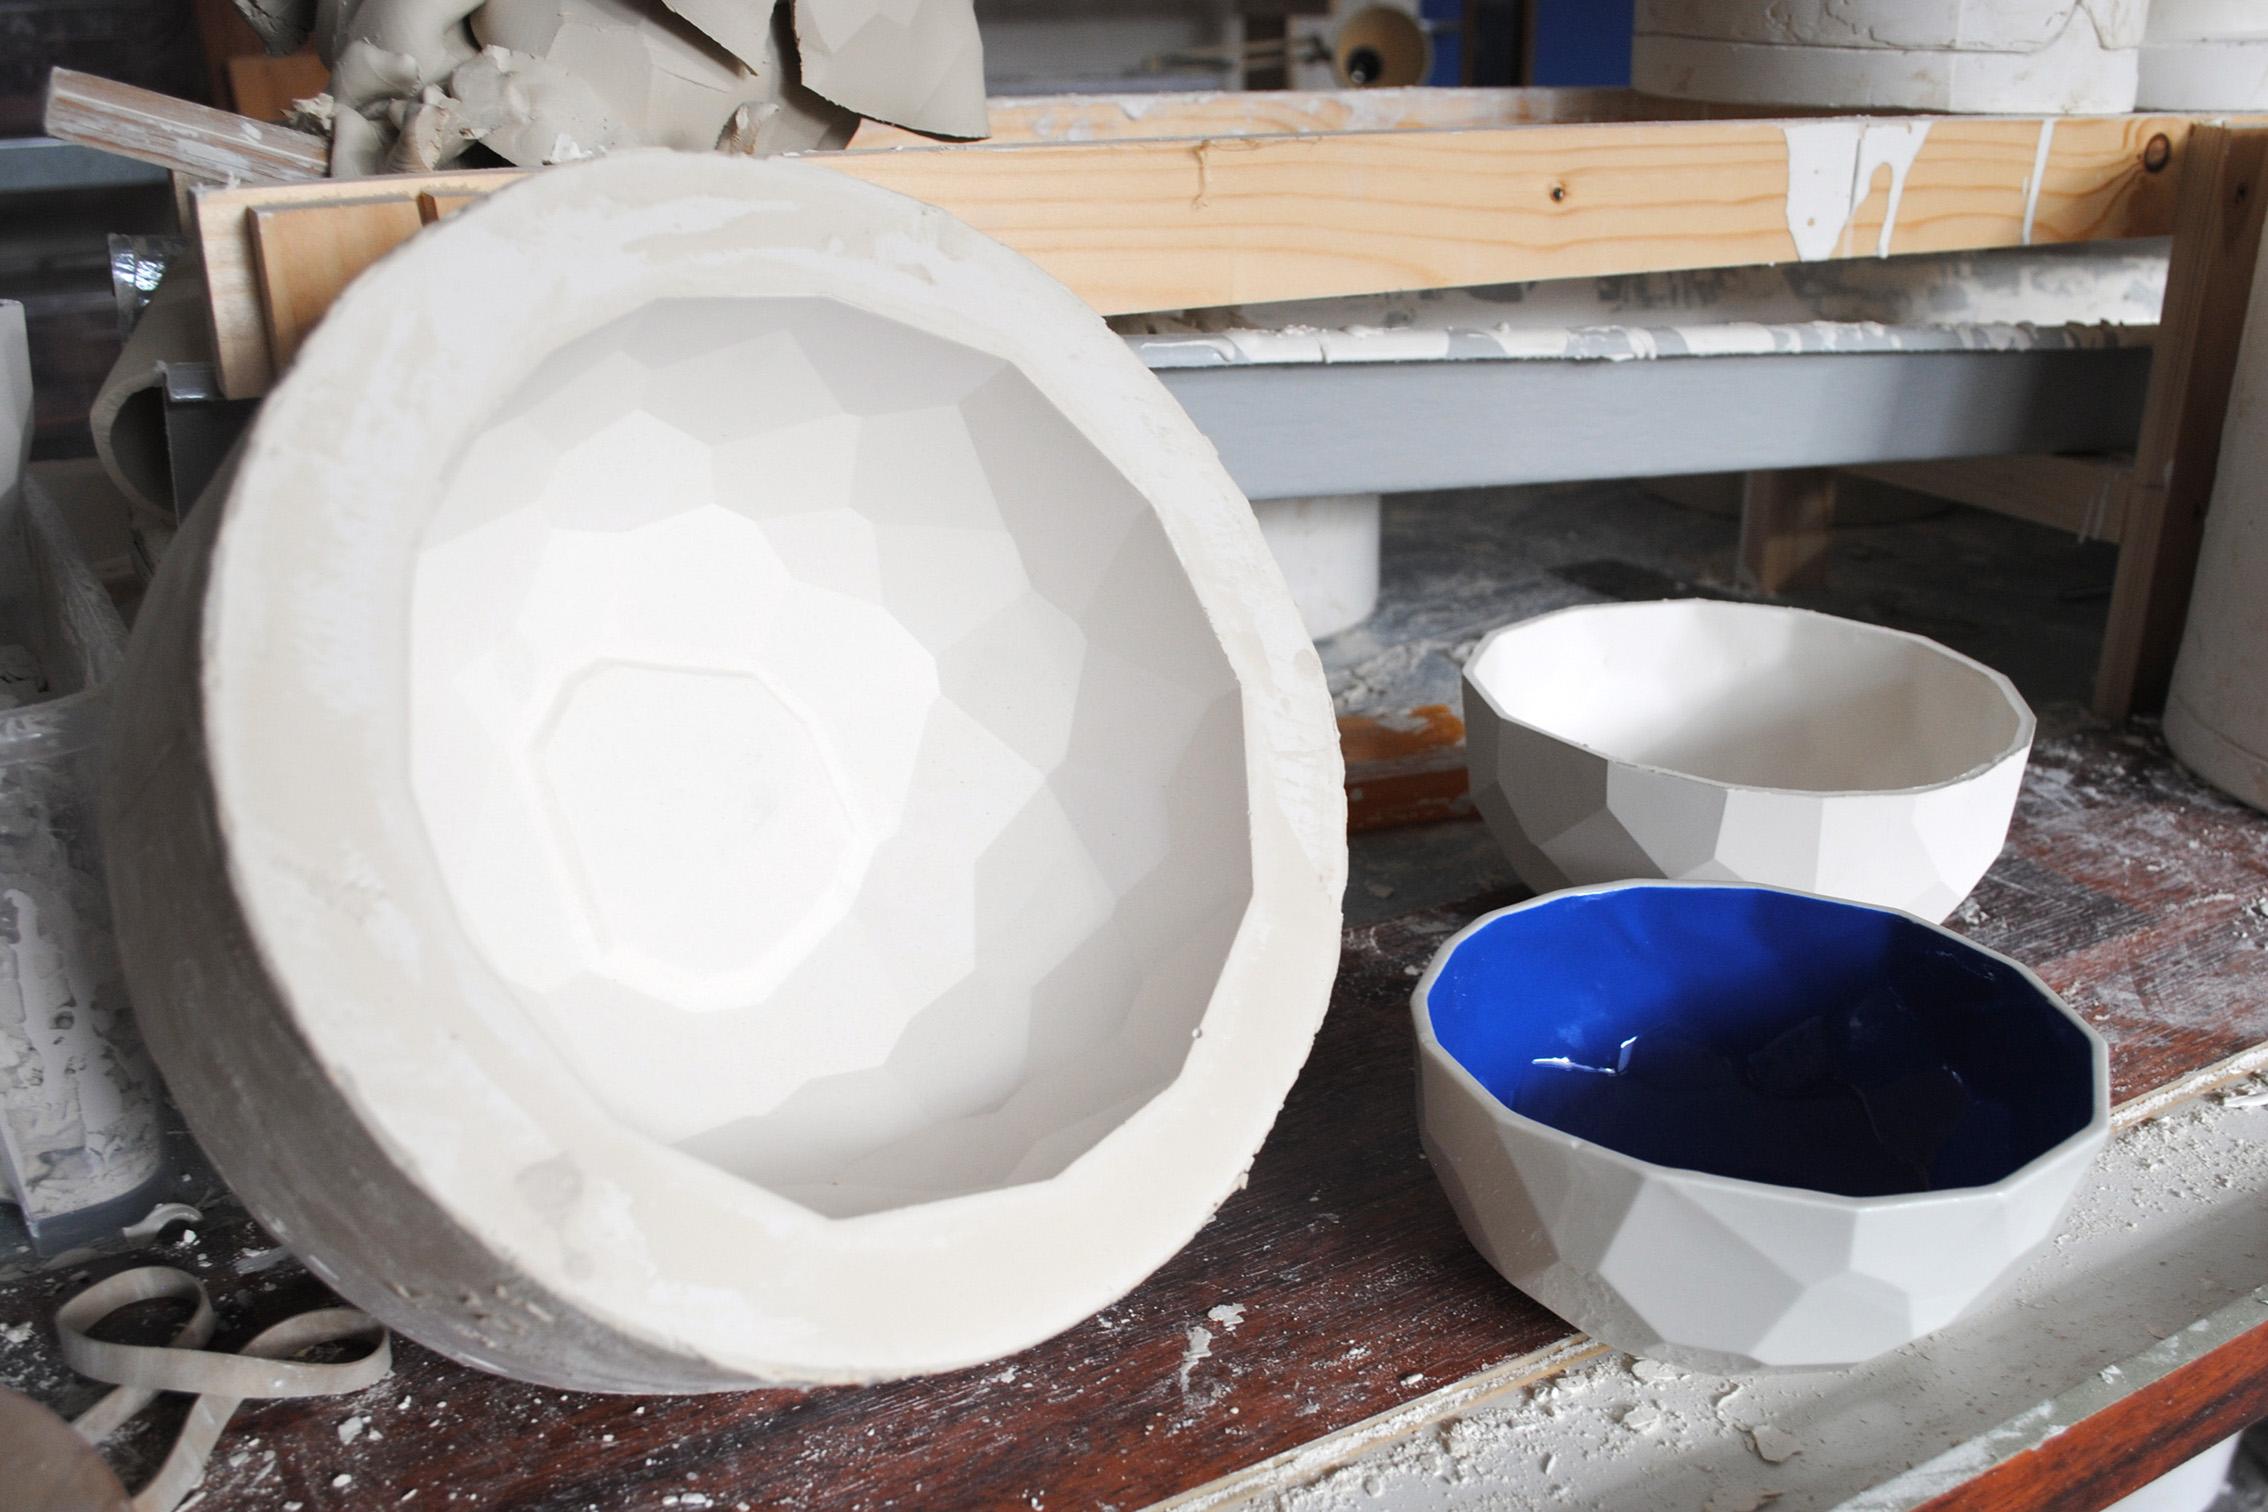 a9_mdba_mdby_manufactured_ceramics_design_studio_lorier_ production